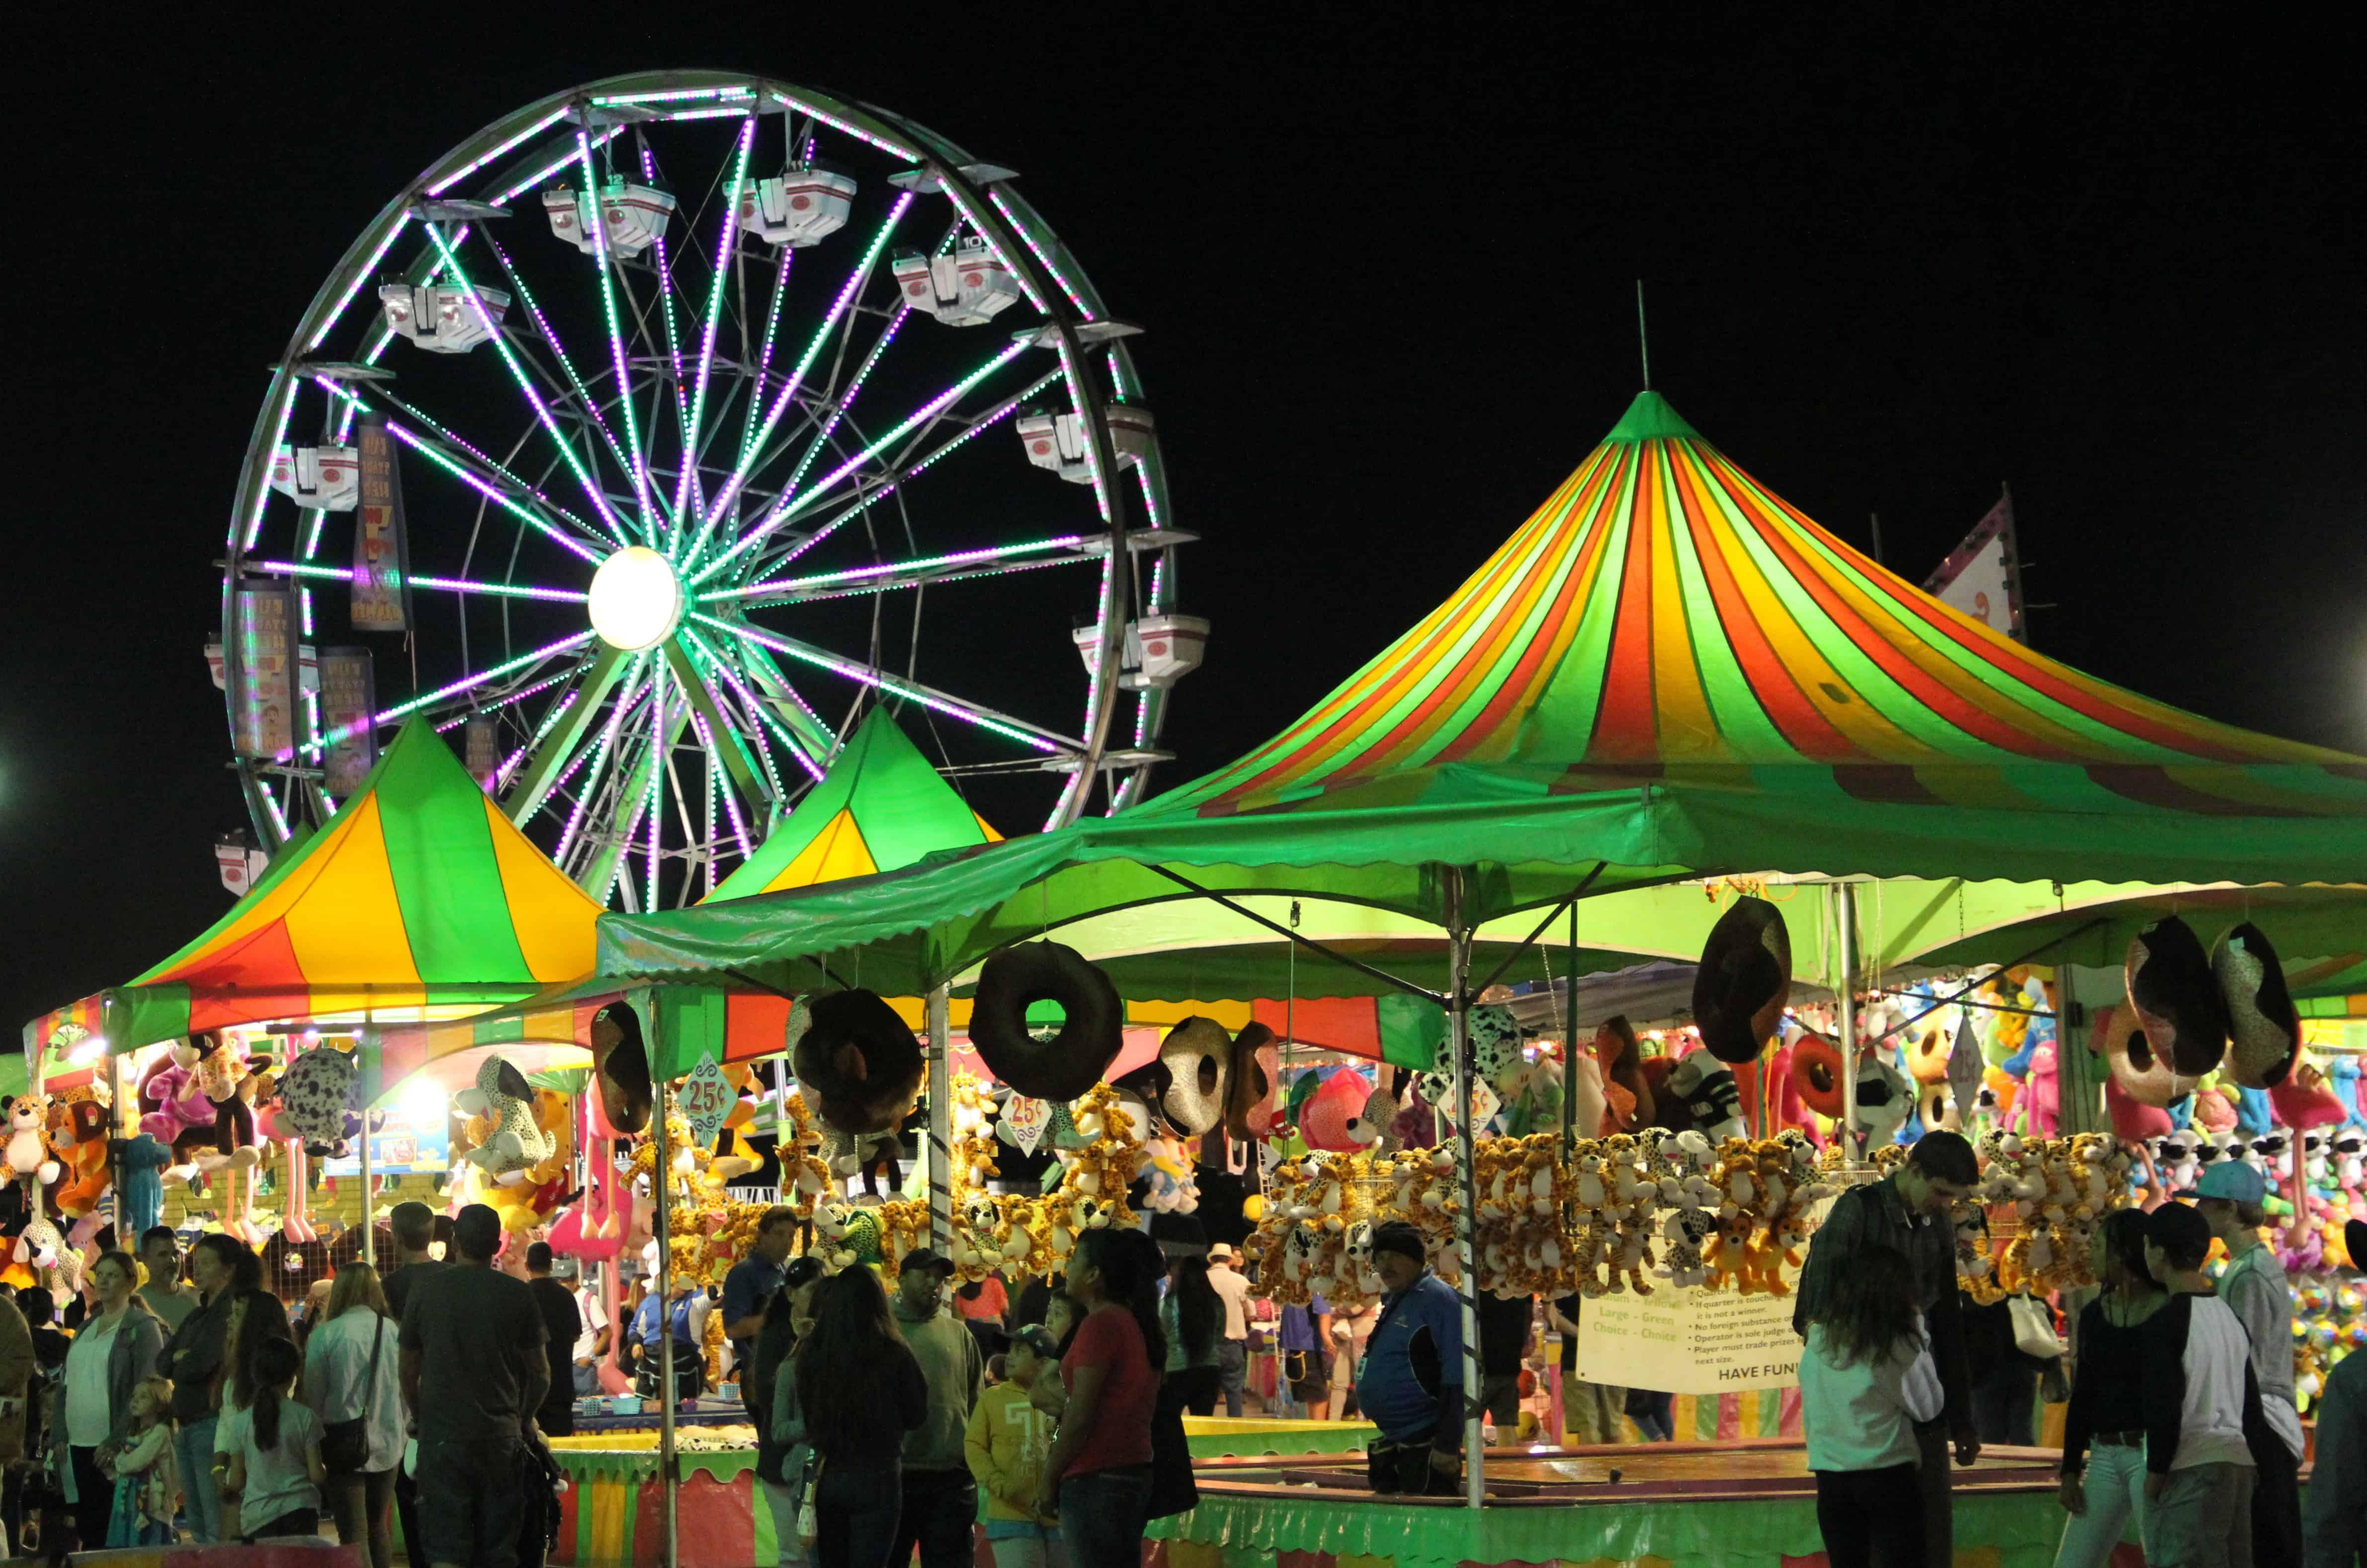 Our Local County Fair